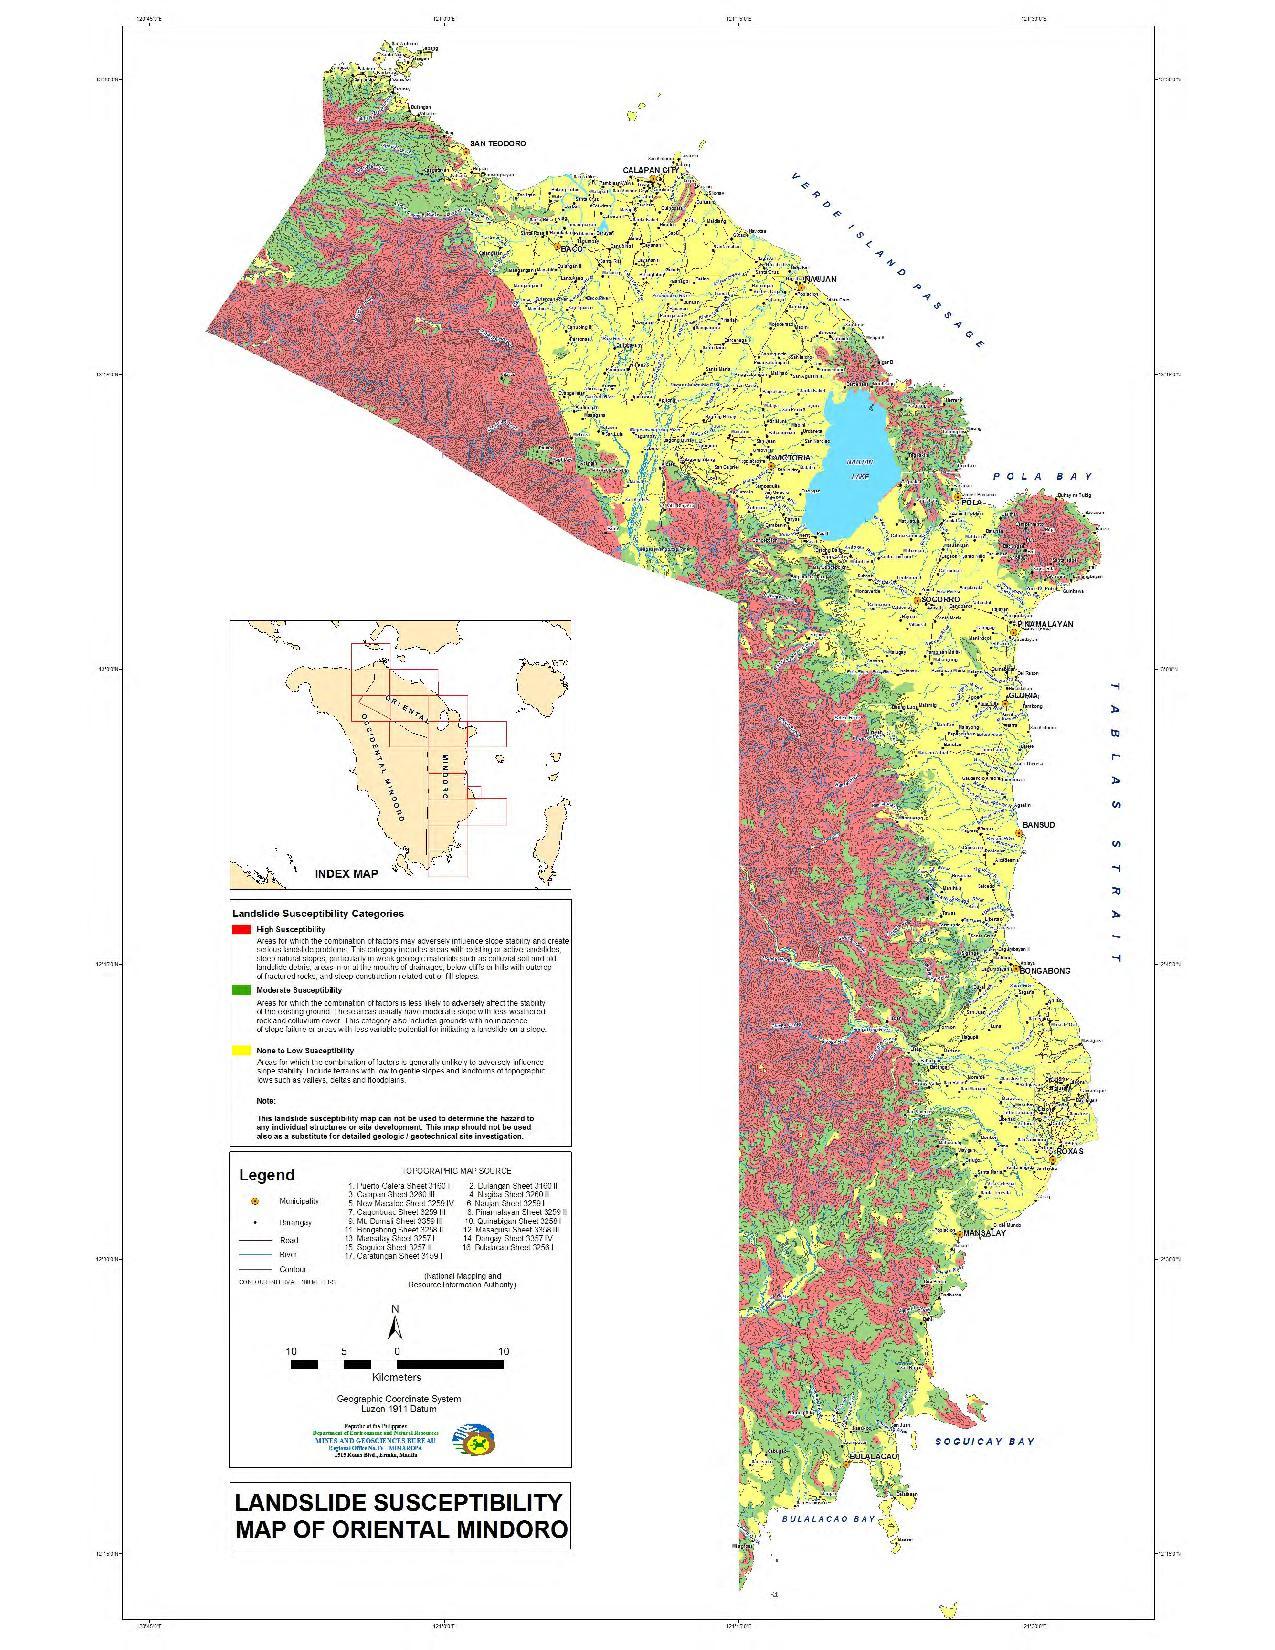 Landslide Susceptibility Map of Oriental Mindoro